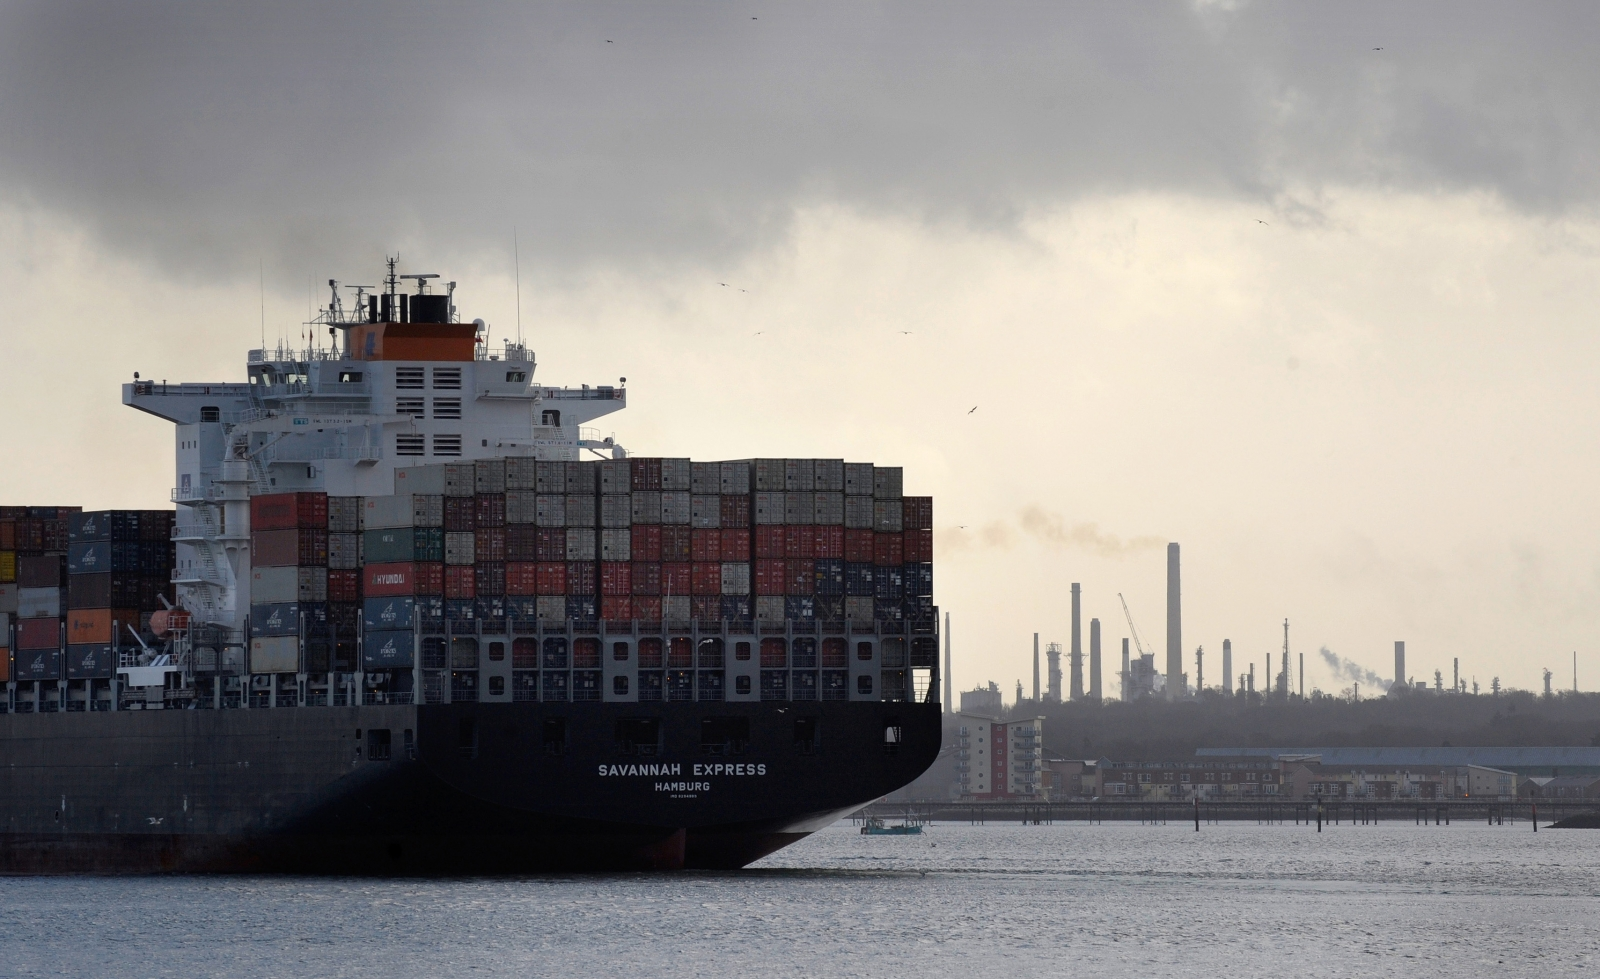 UK trade ship